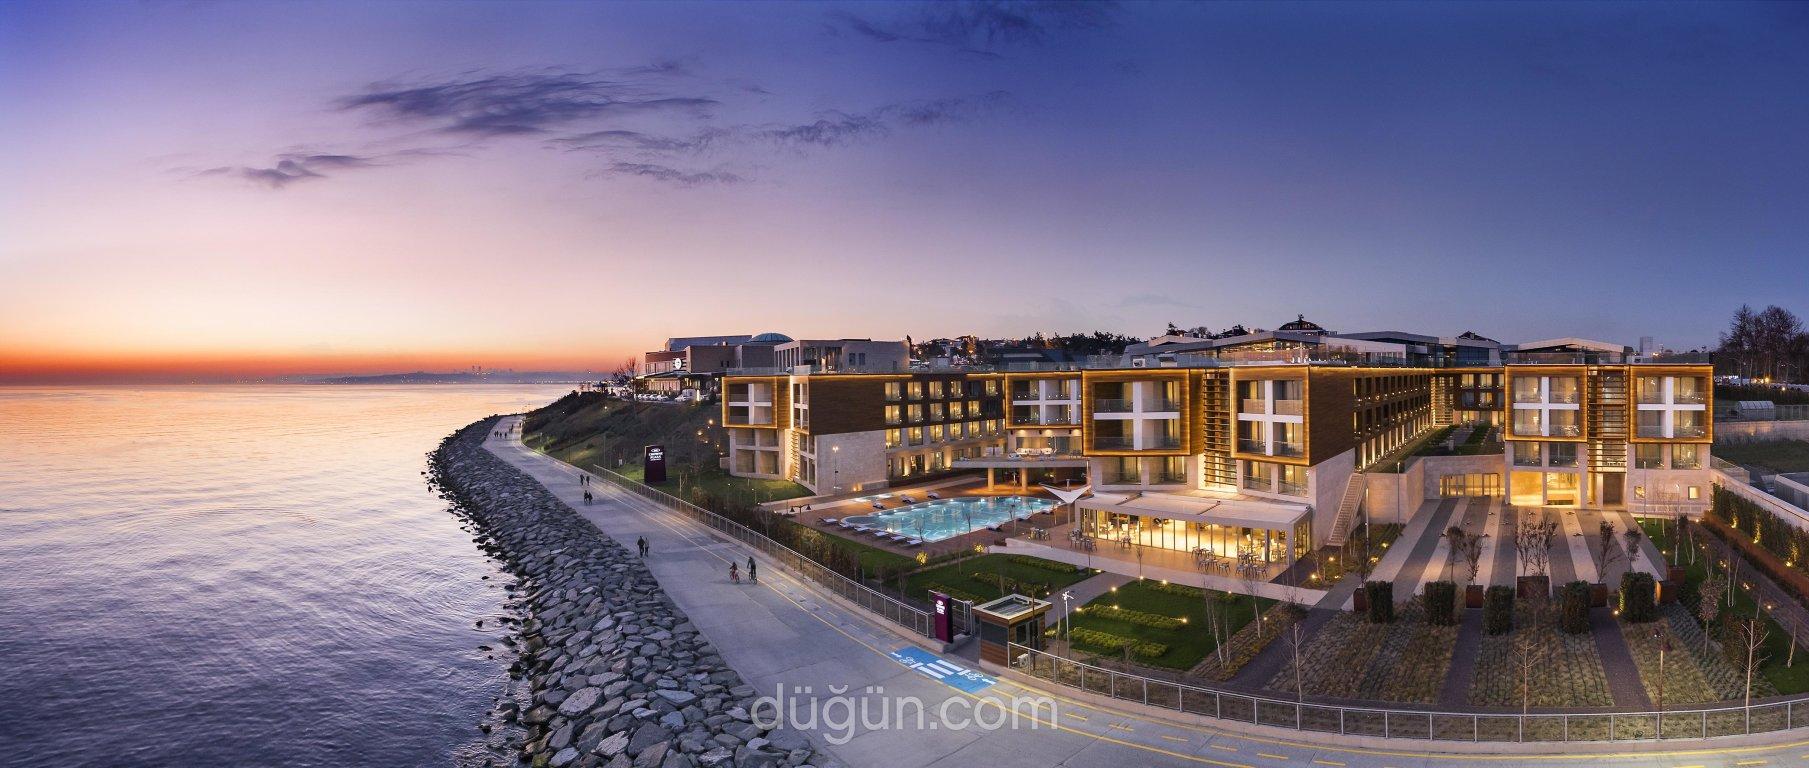 Crowne Plaza İstanbul - La Brise